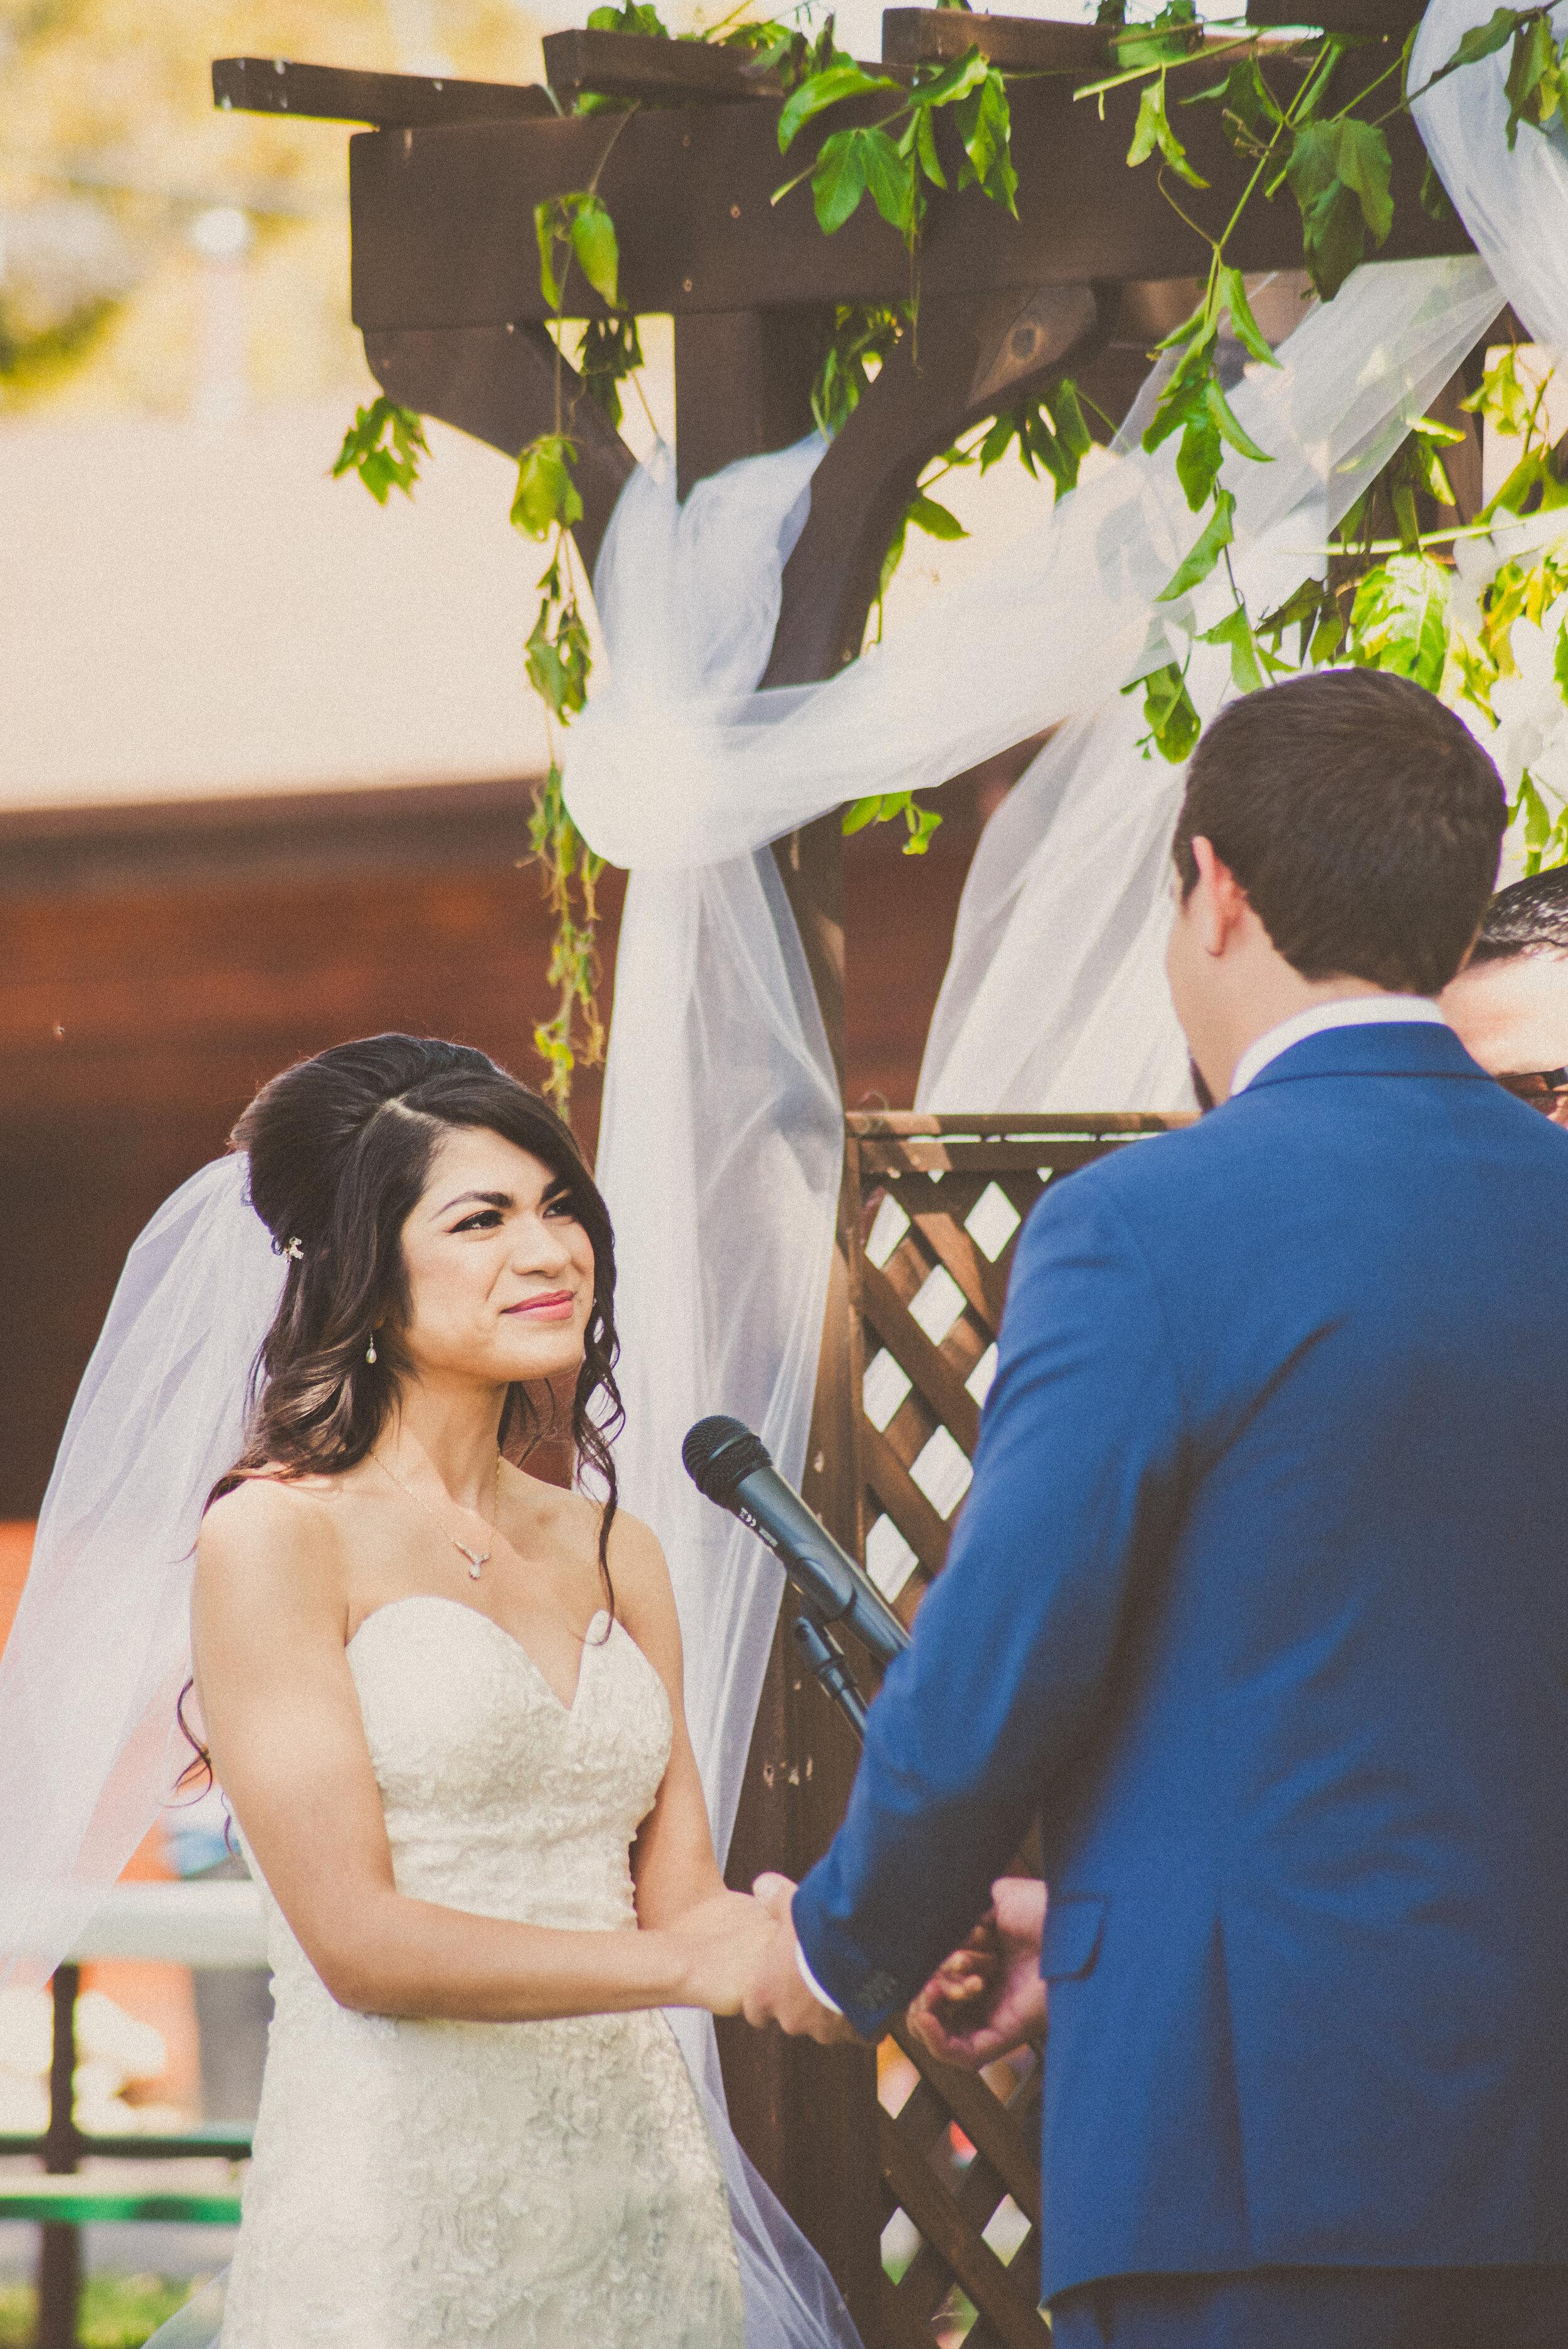 Loza Wedding - Ceremony-51.jpg